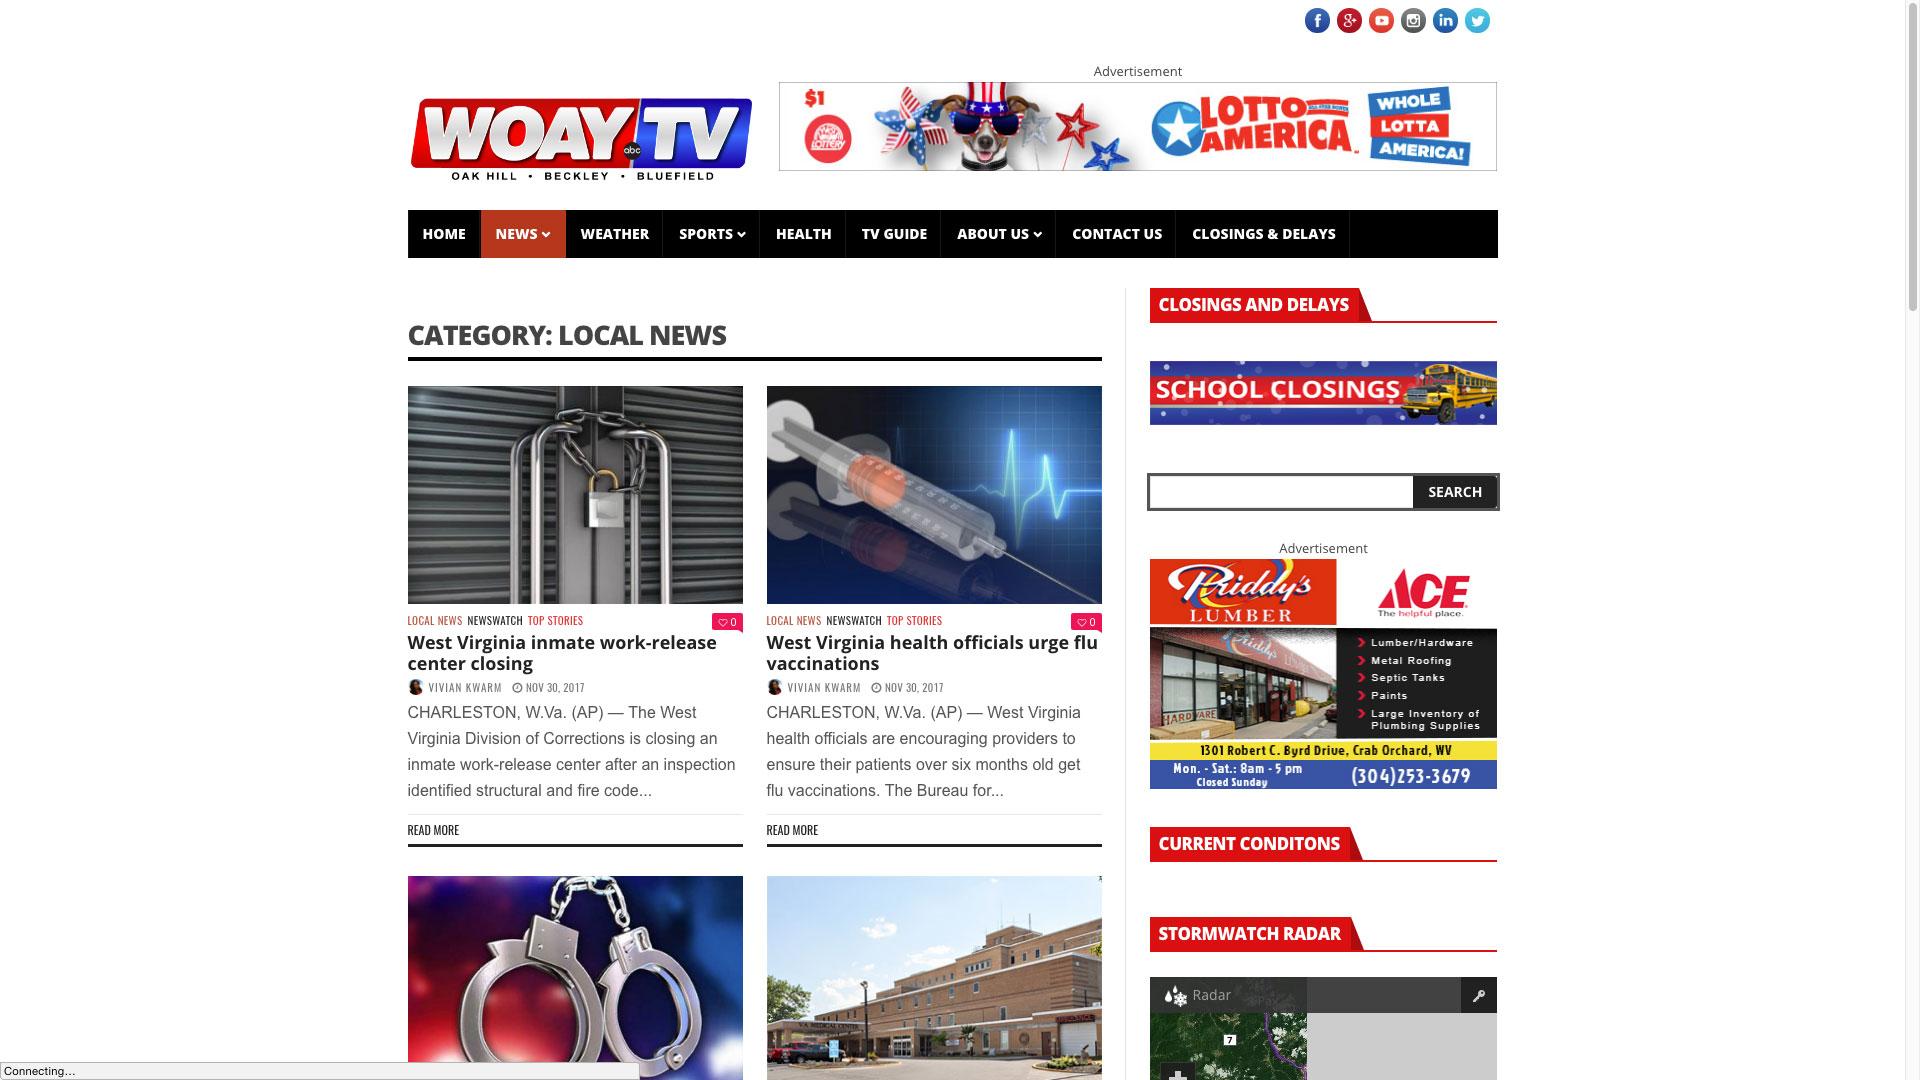 woay-local-news-web-design